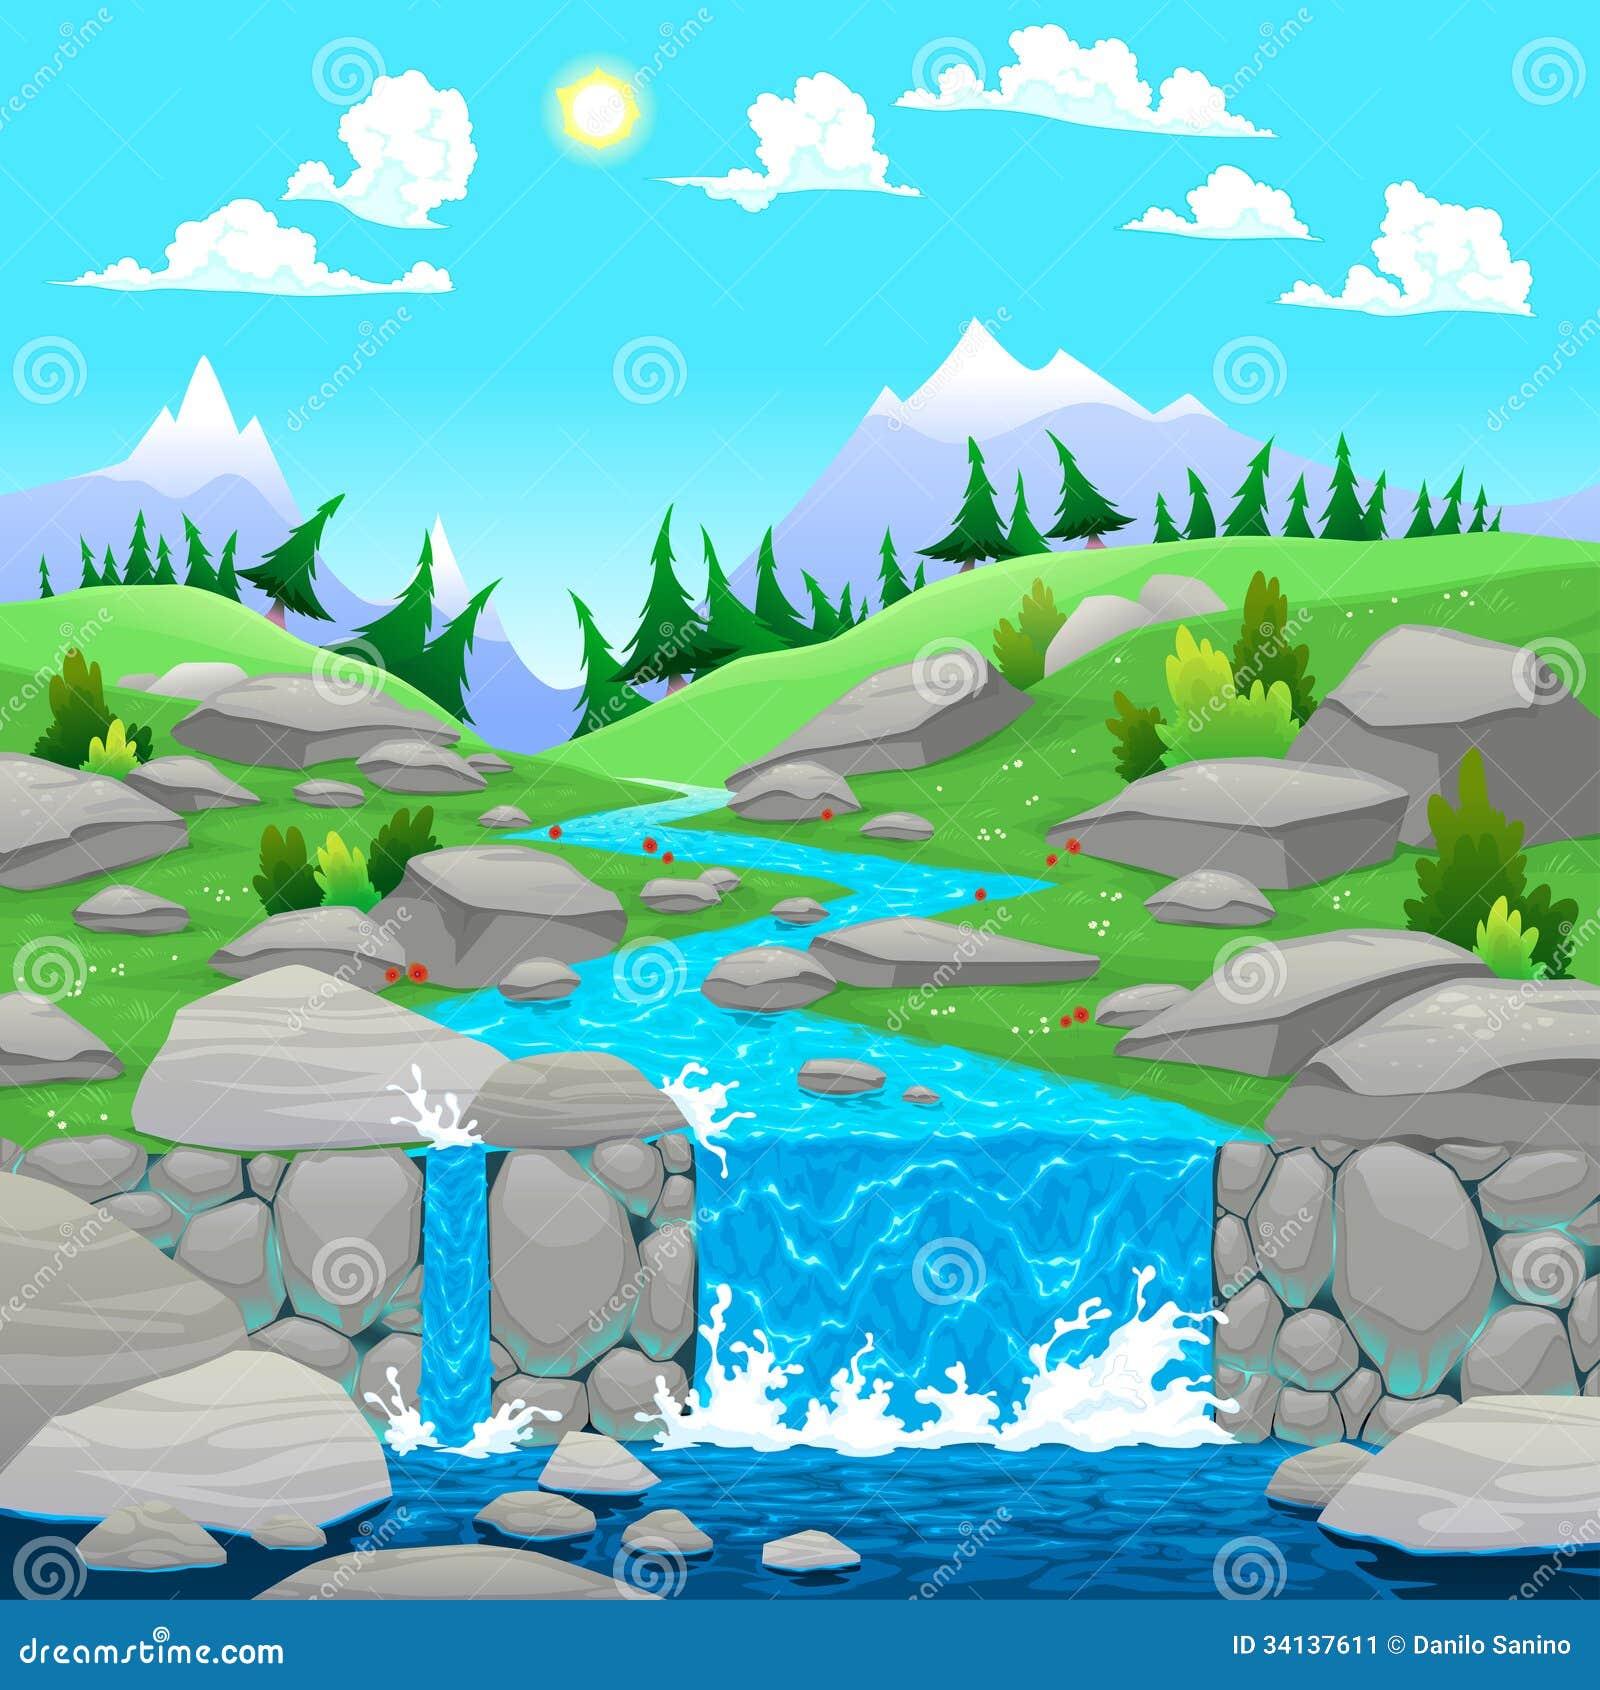 flowing river cartoon - photo #43